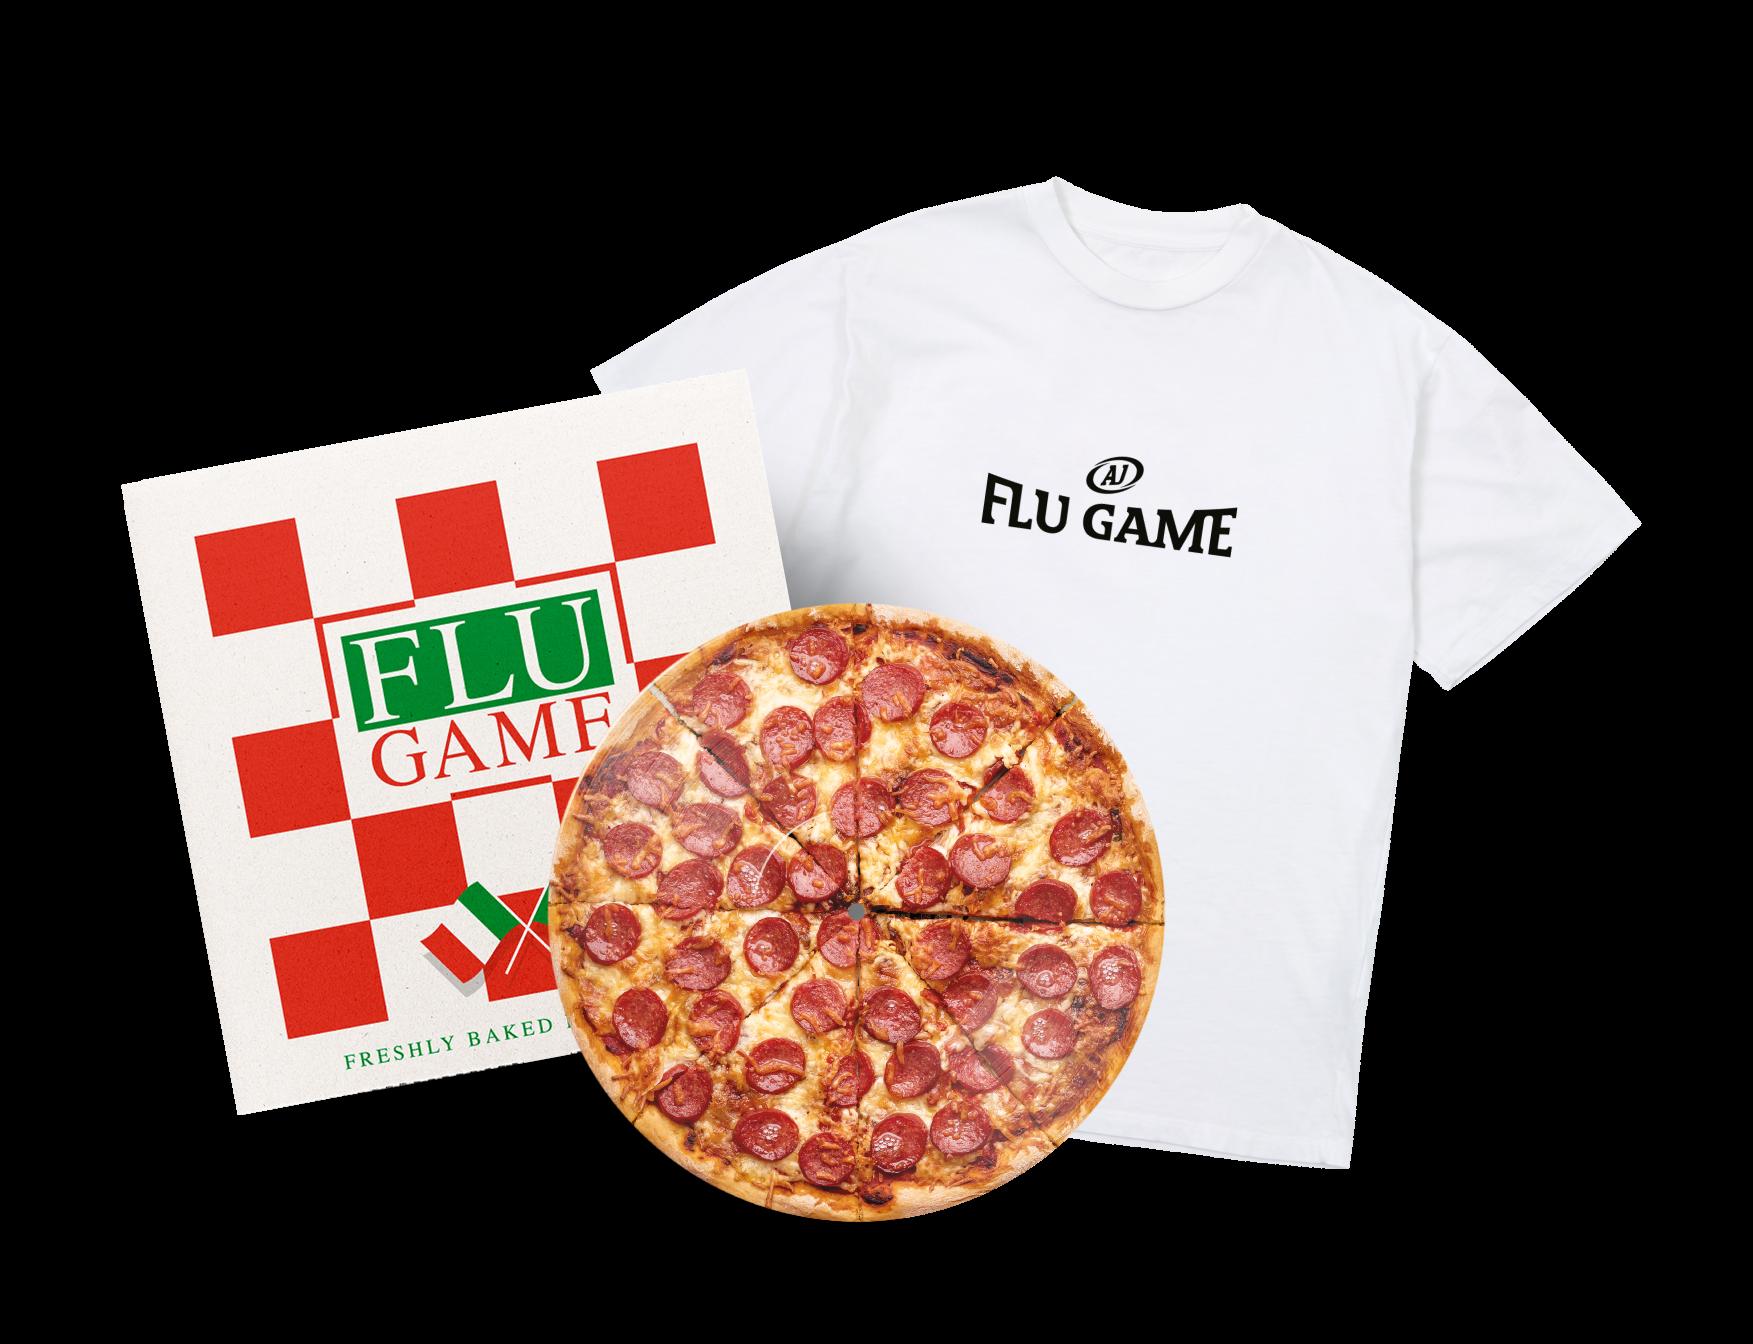 Flu Game Limited Edition LP + T-Shirt Bundle - White